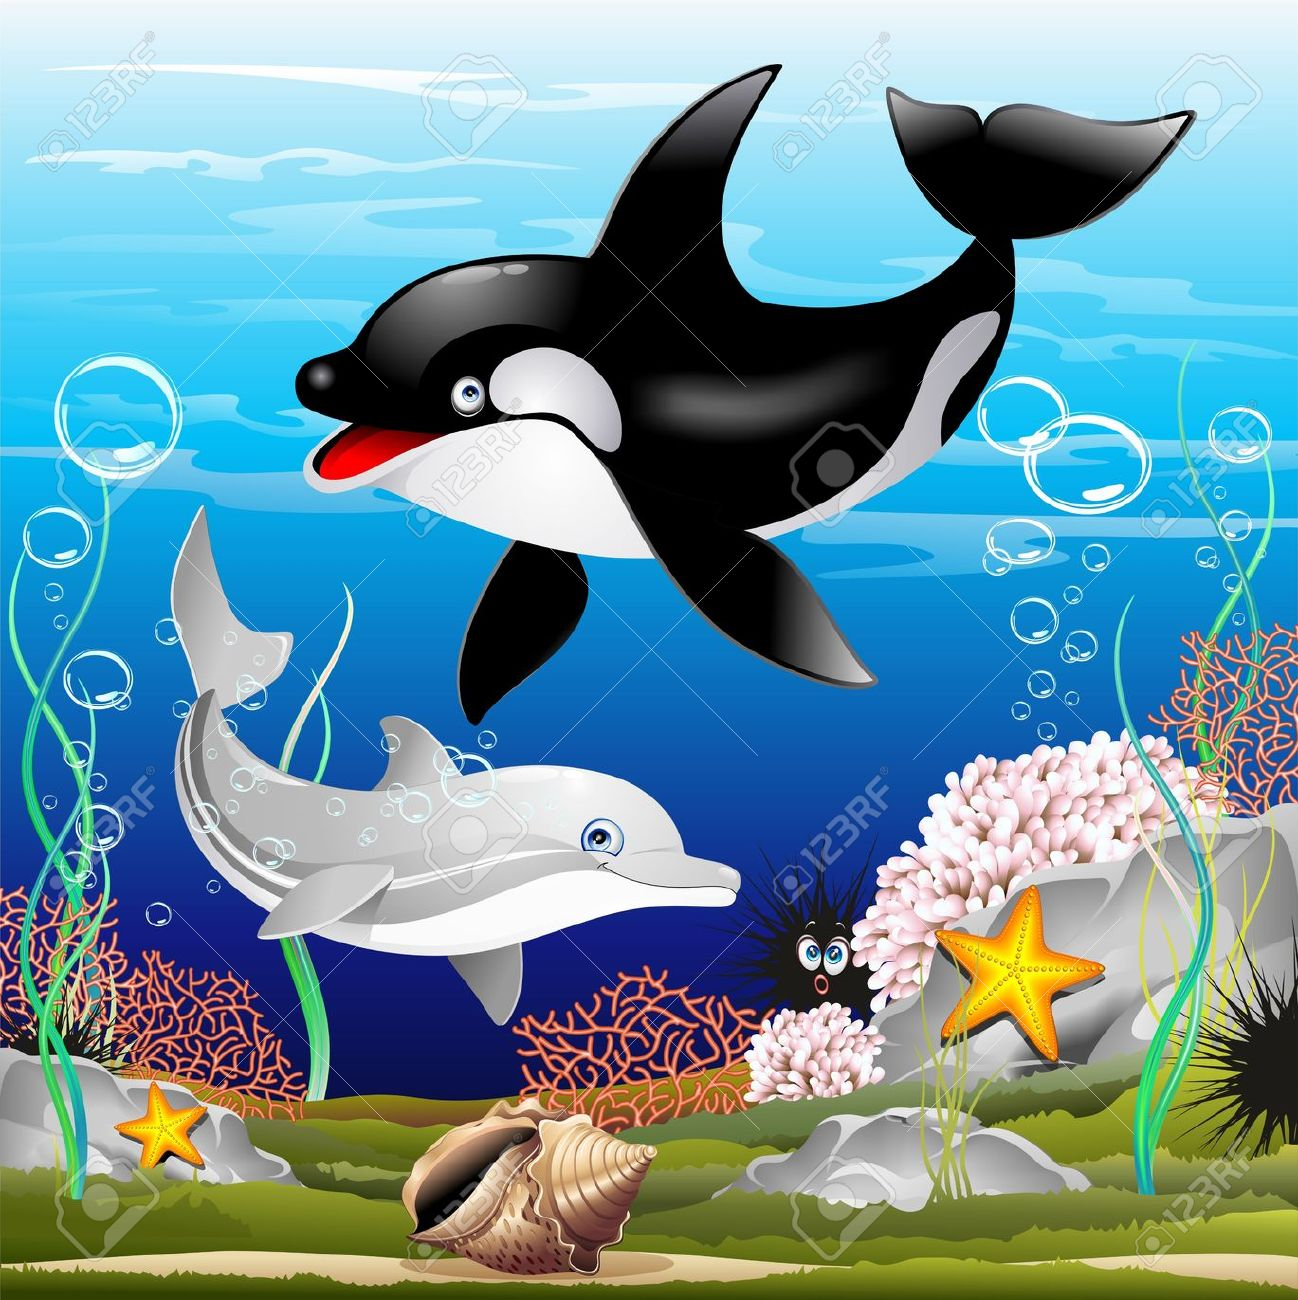 Dolphin And Killer Whale Cartoon On The Ocean Royalty Free.